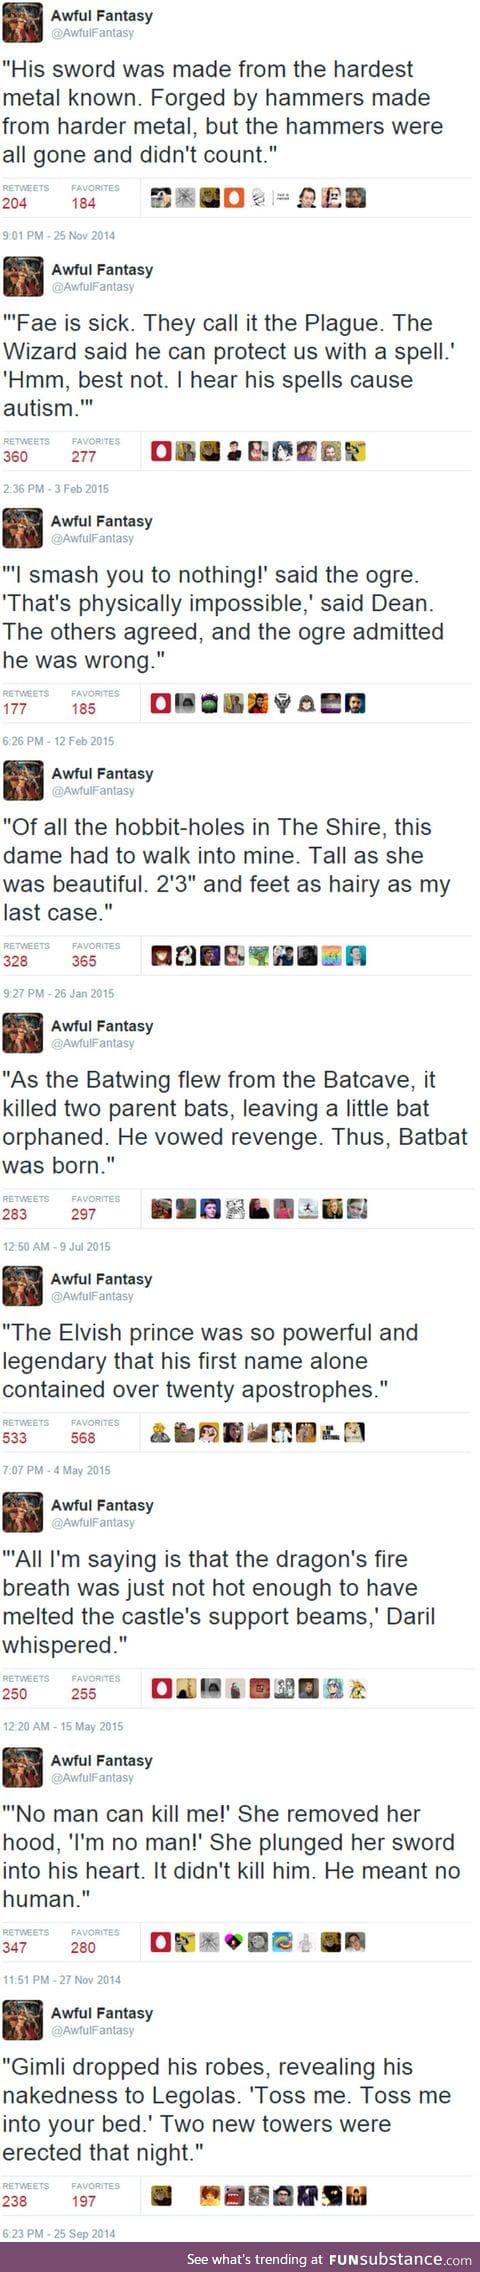 9 awful fantasies